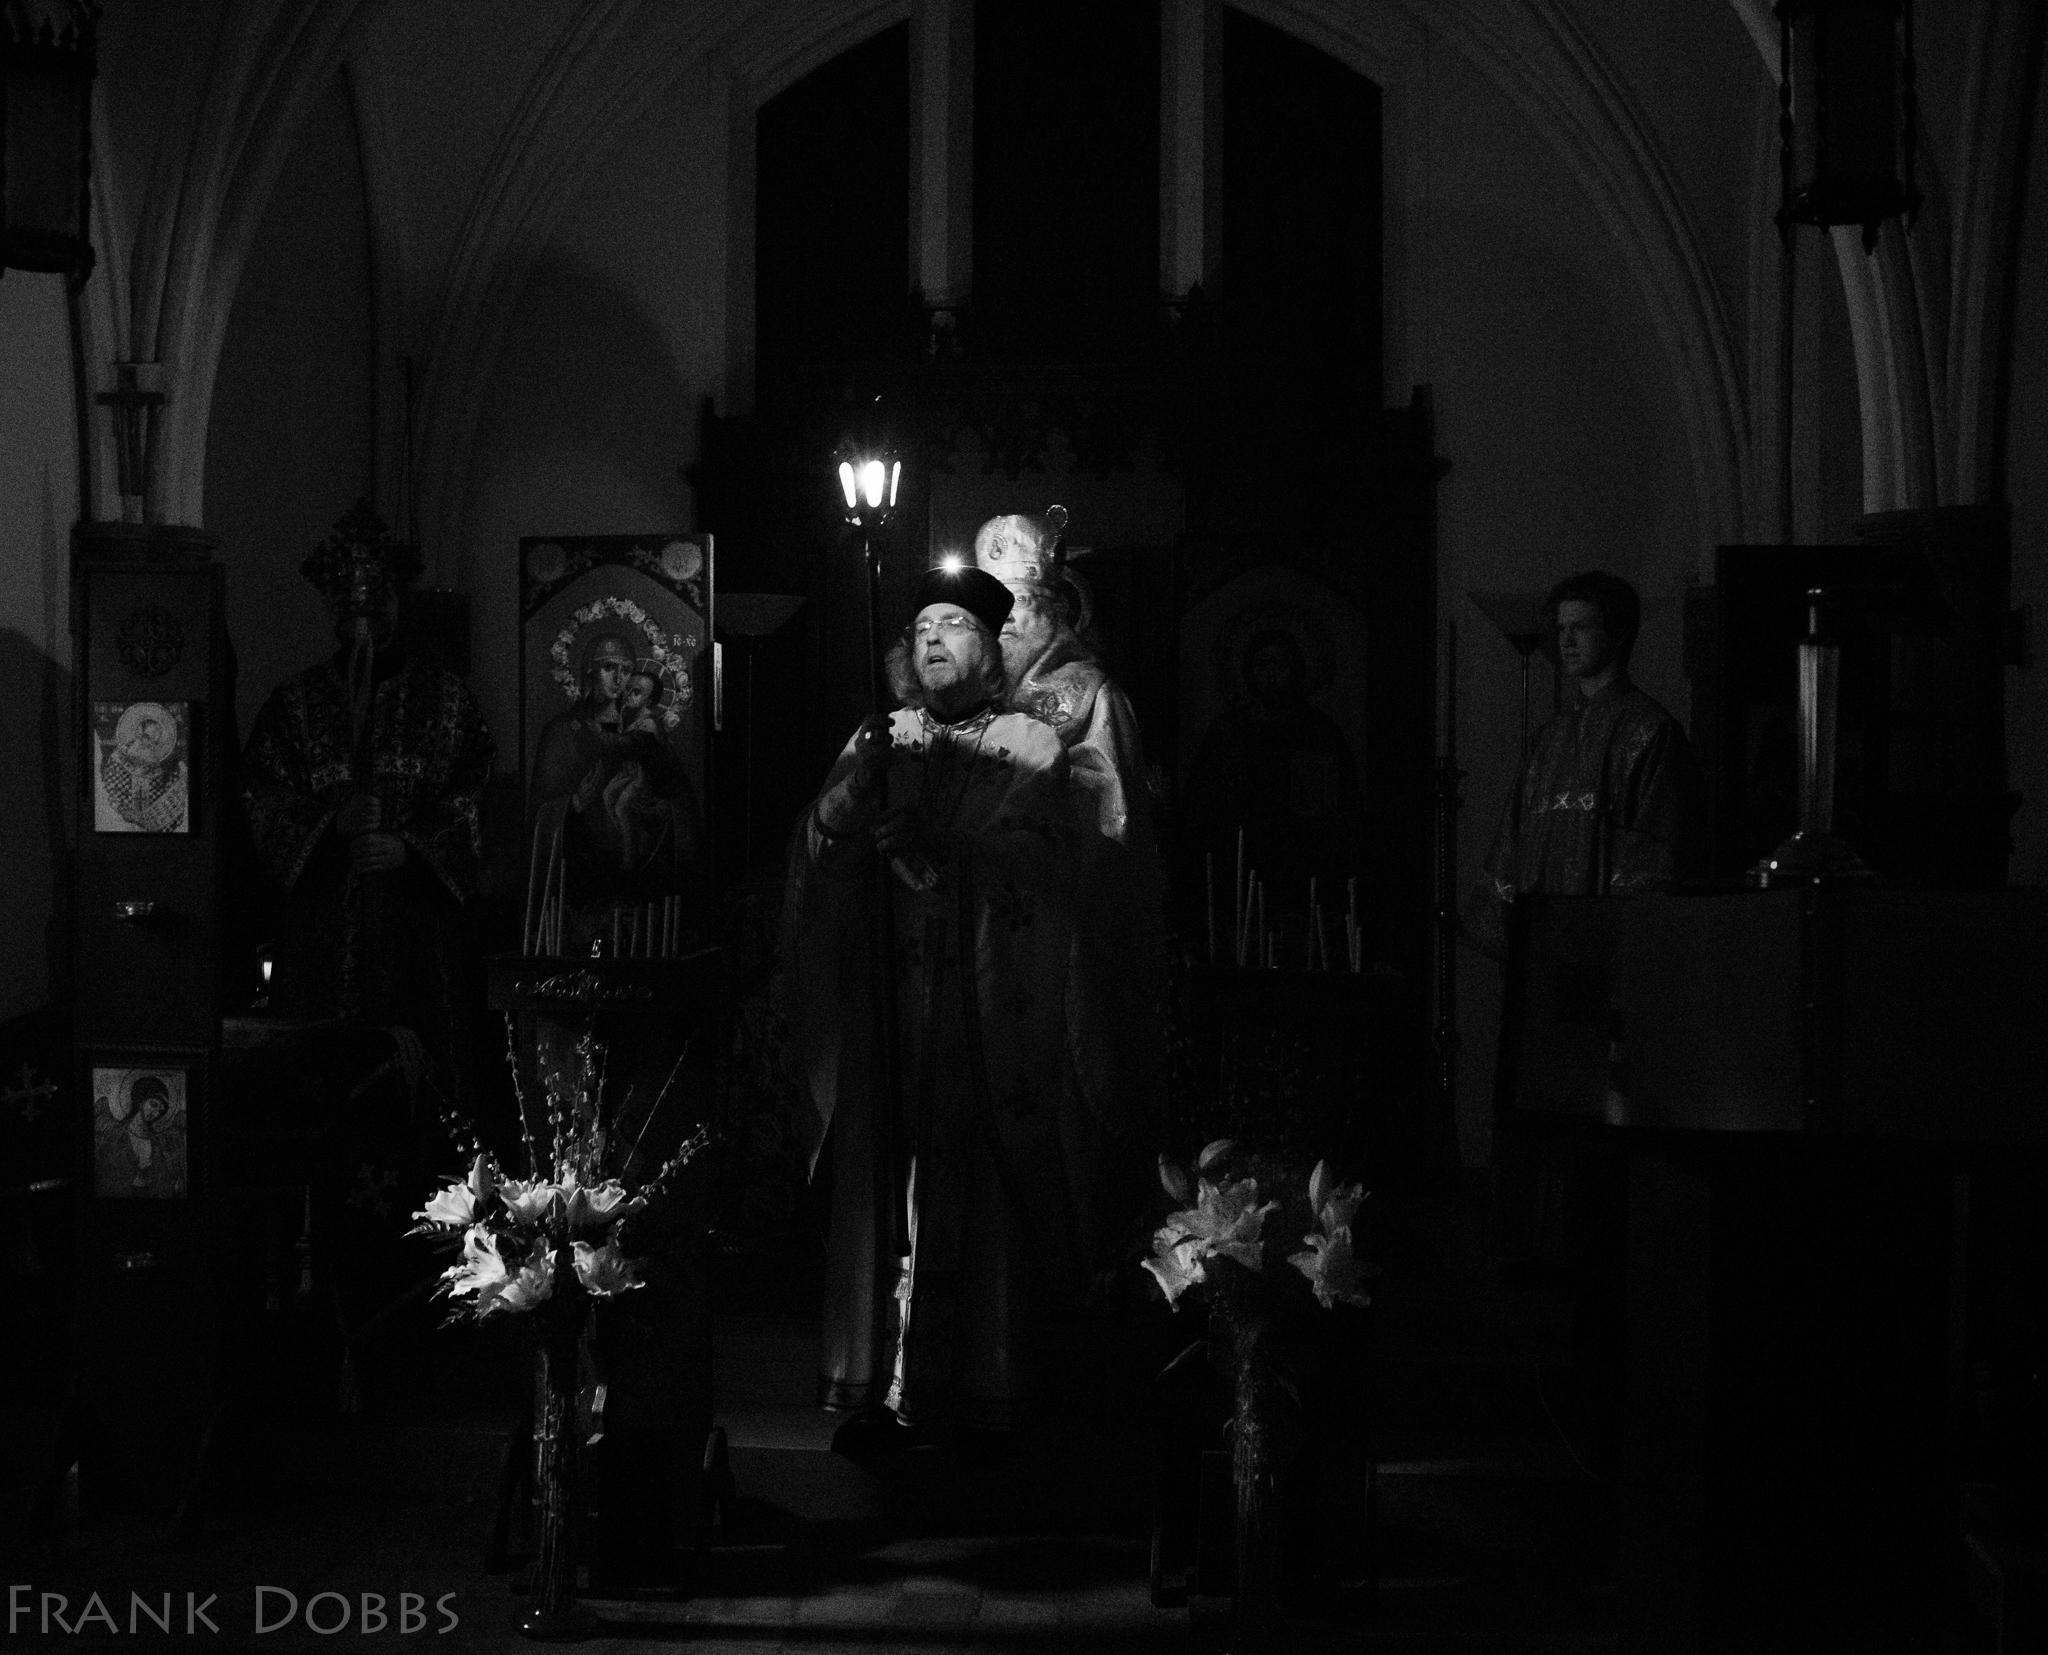 The Light of Christ illumines all people... 041101